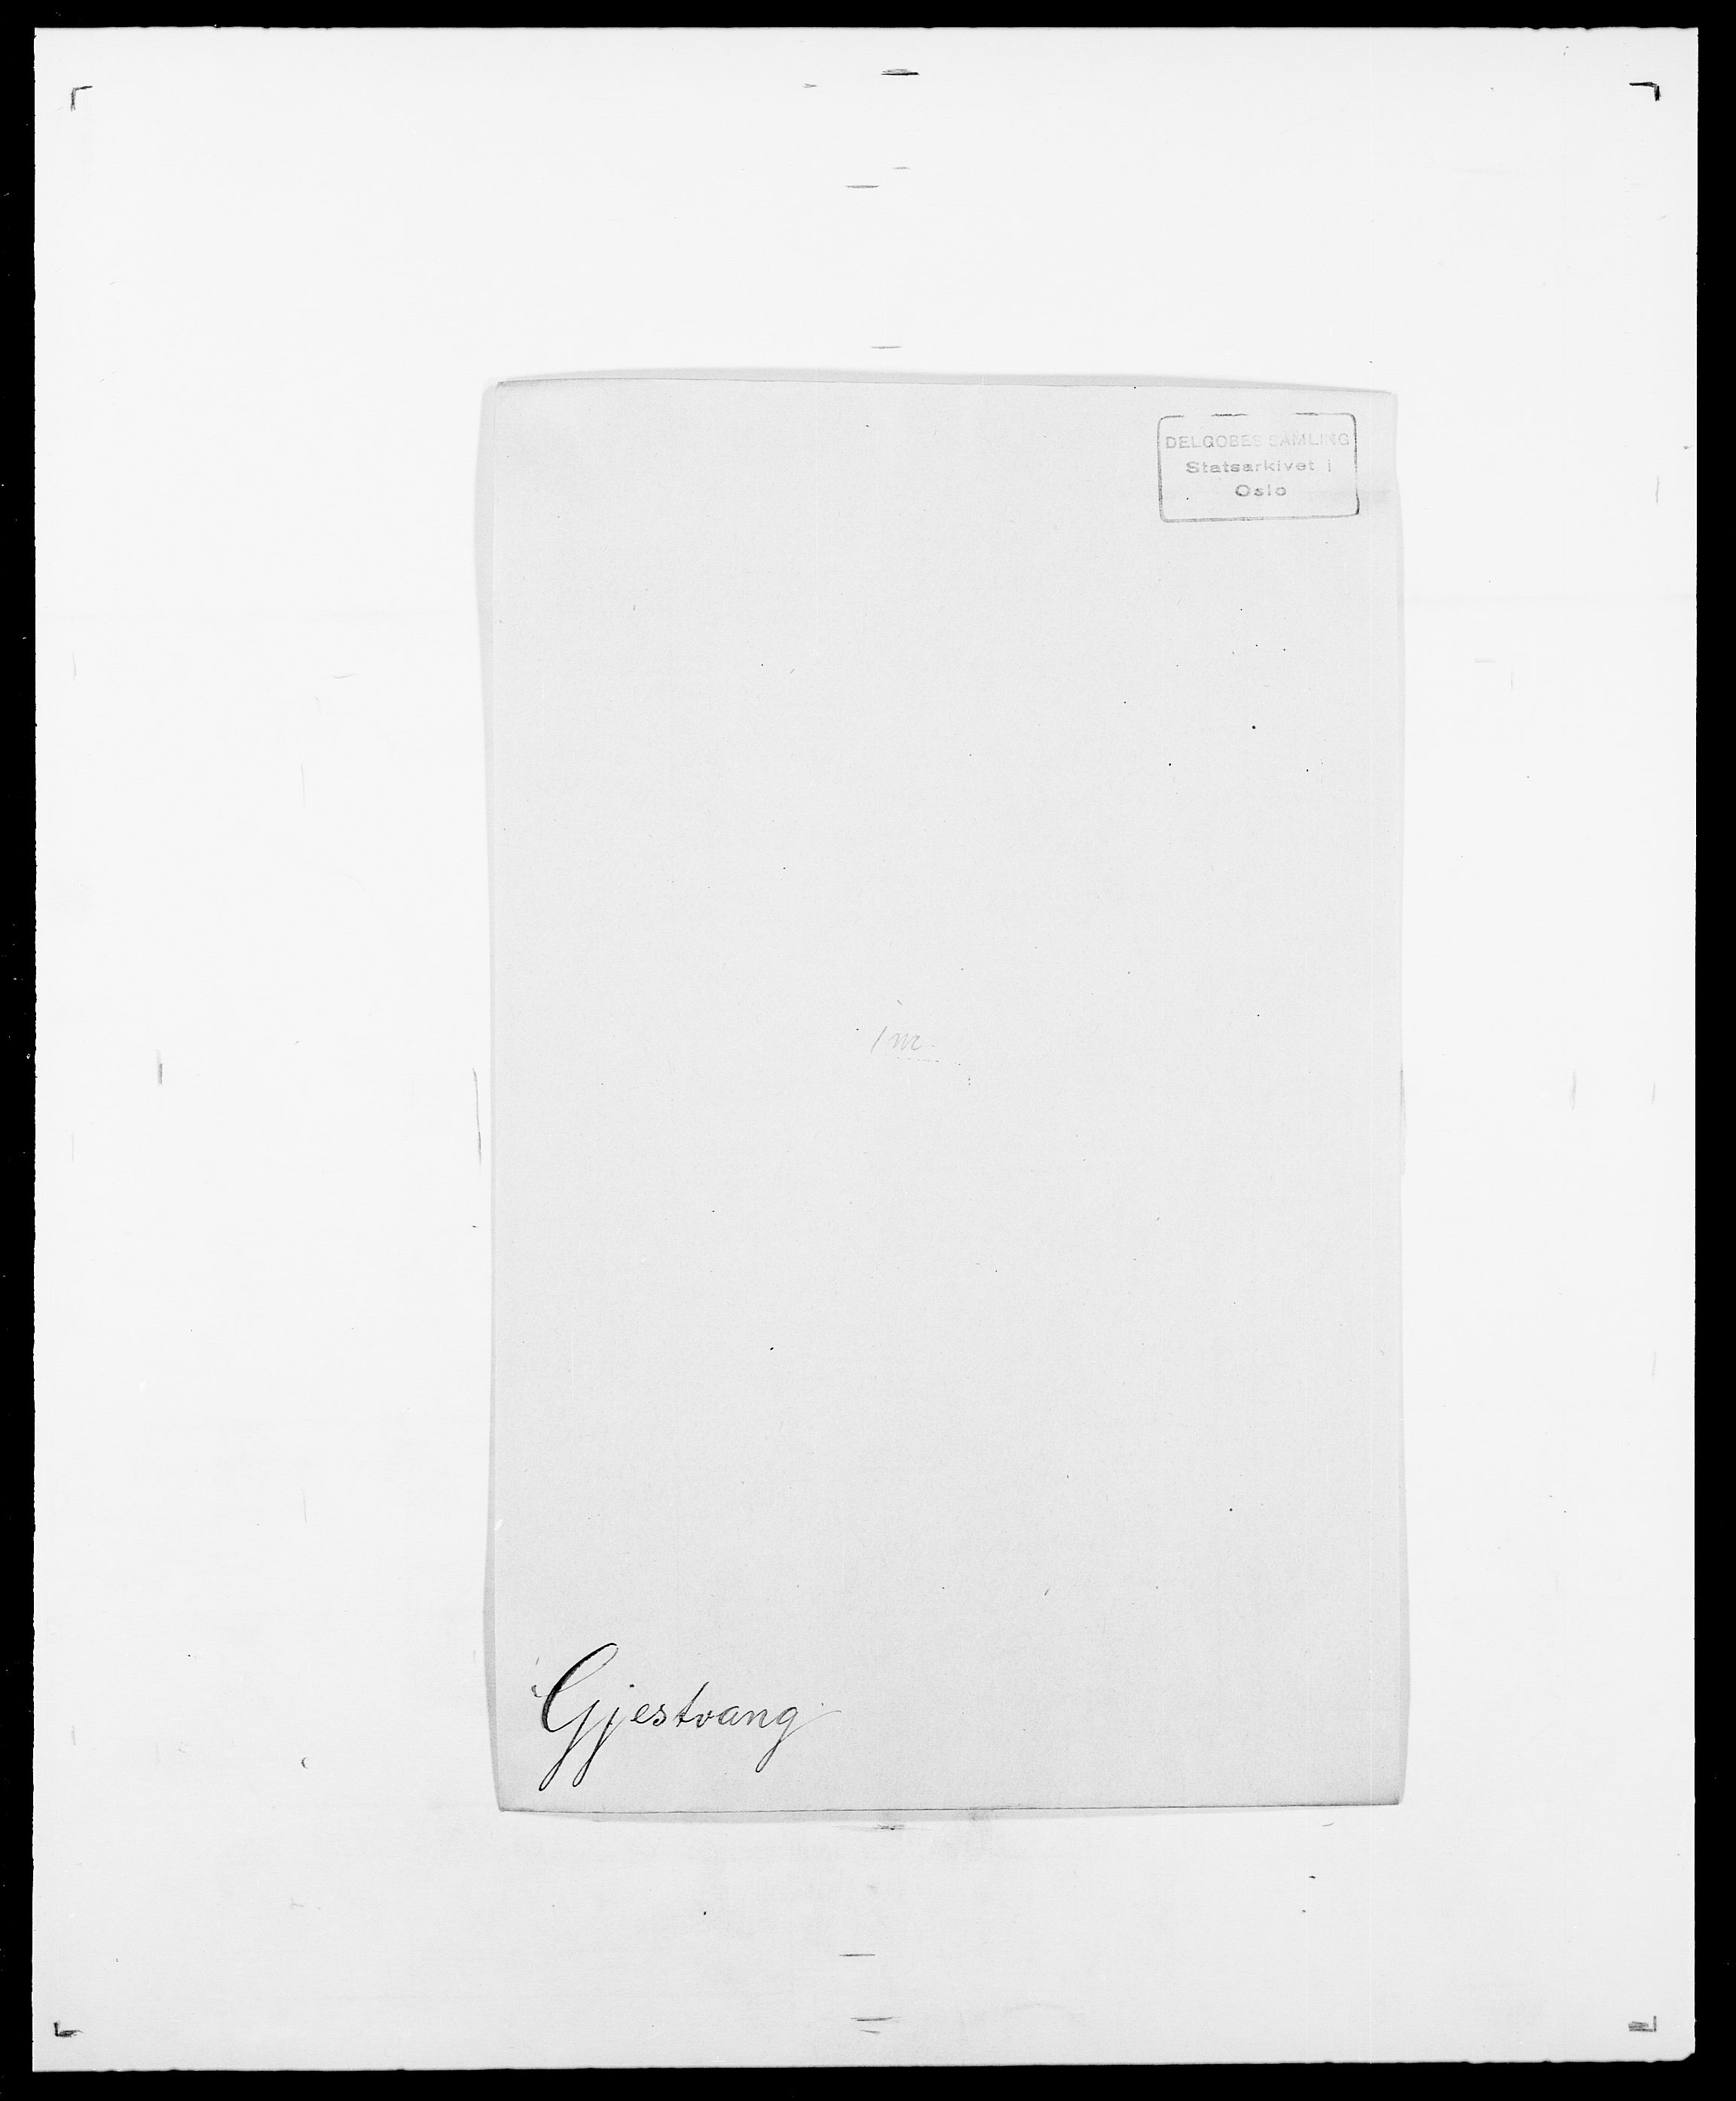 SAO, Delgobe, Charles Antoine - samling, D/Da/L0014: Giebdhausen - Grip, s. 199